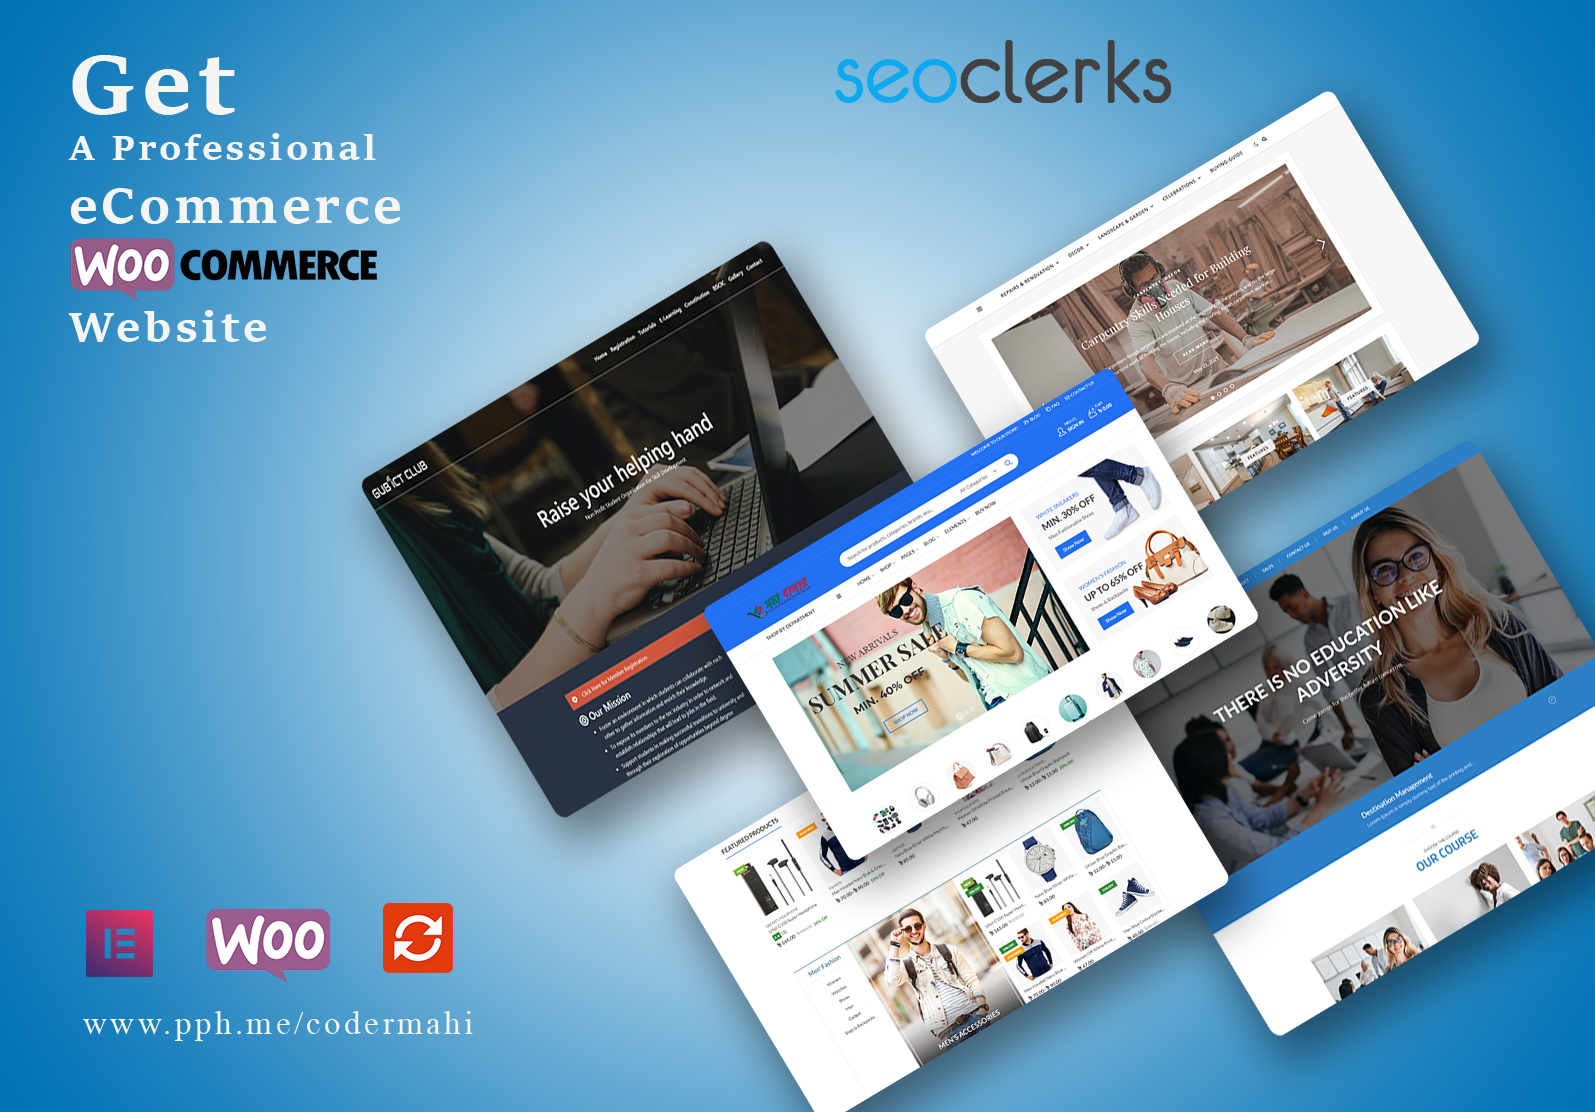 I will create ecommerce wordpress website and woocommerce store